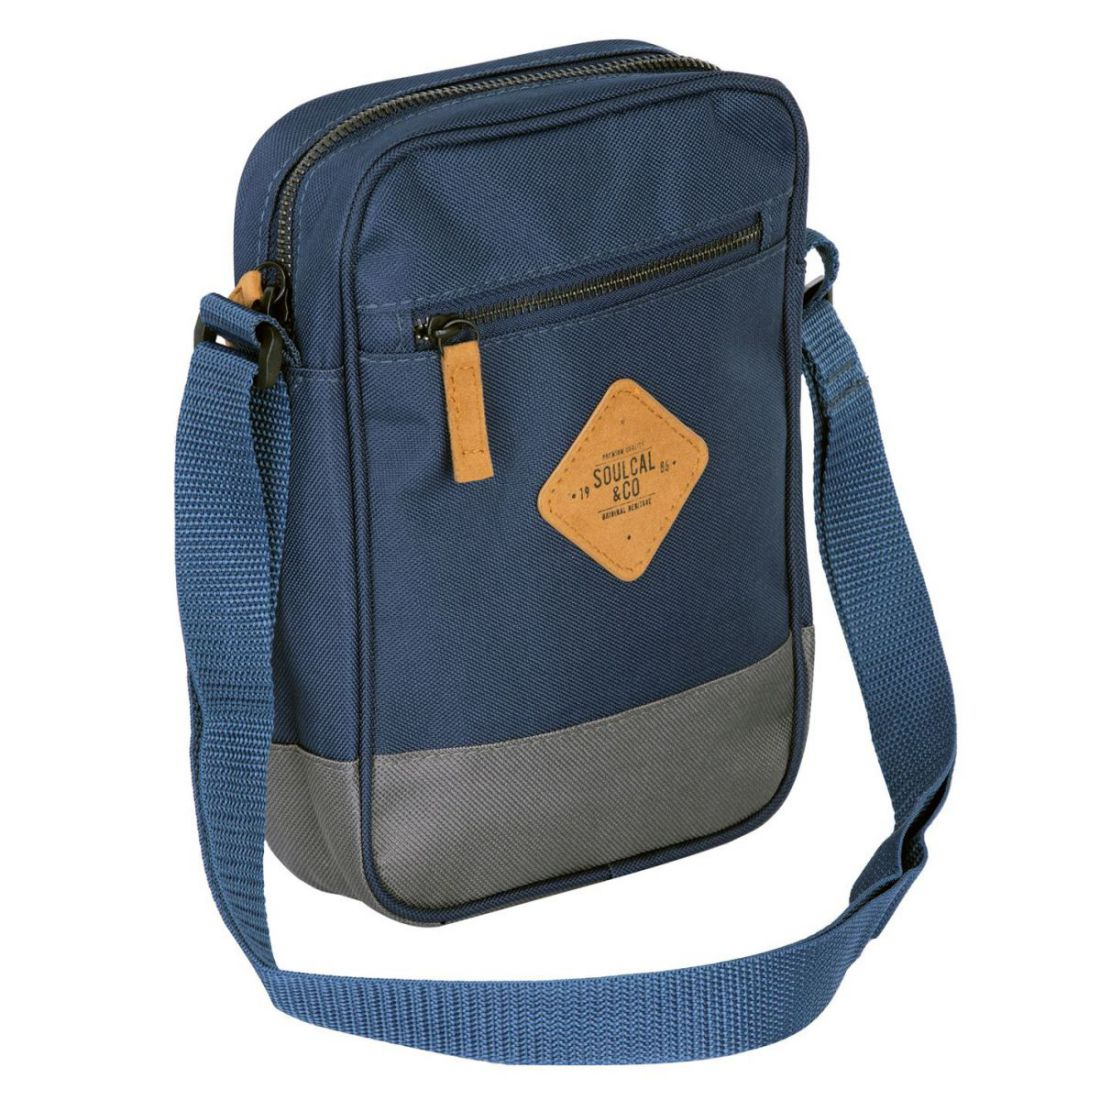 Unisex-SoulCal-Mini-Gadget-Bag-Zip-New thumbnail 2